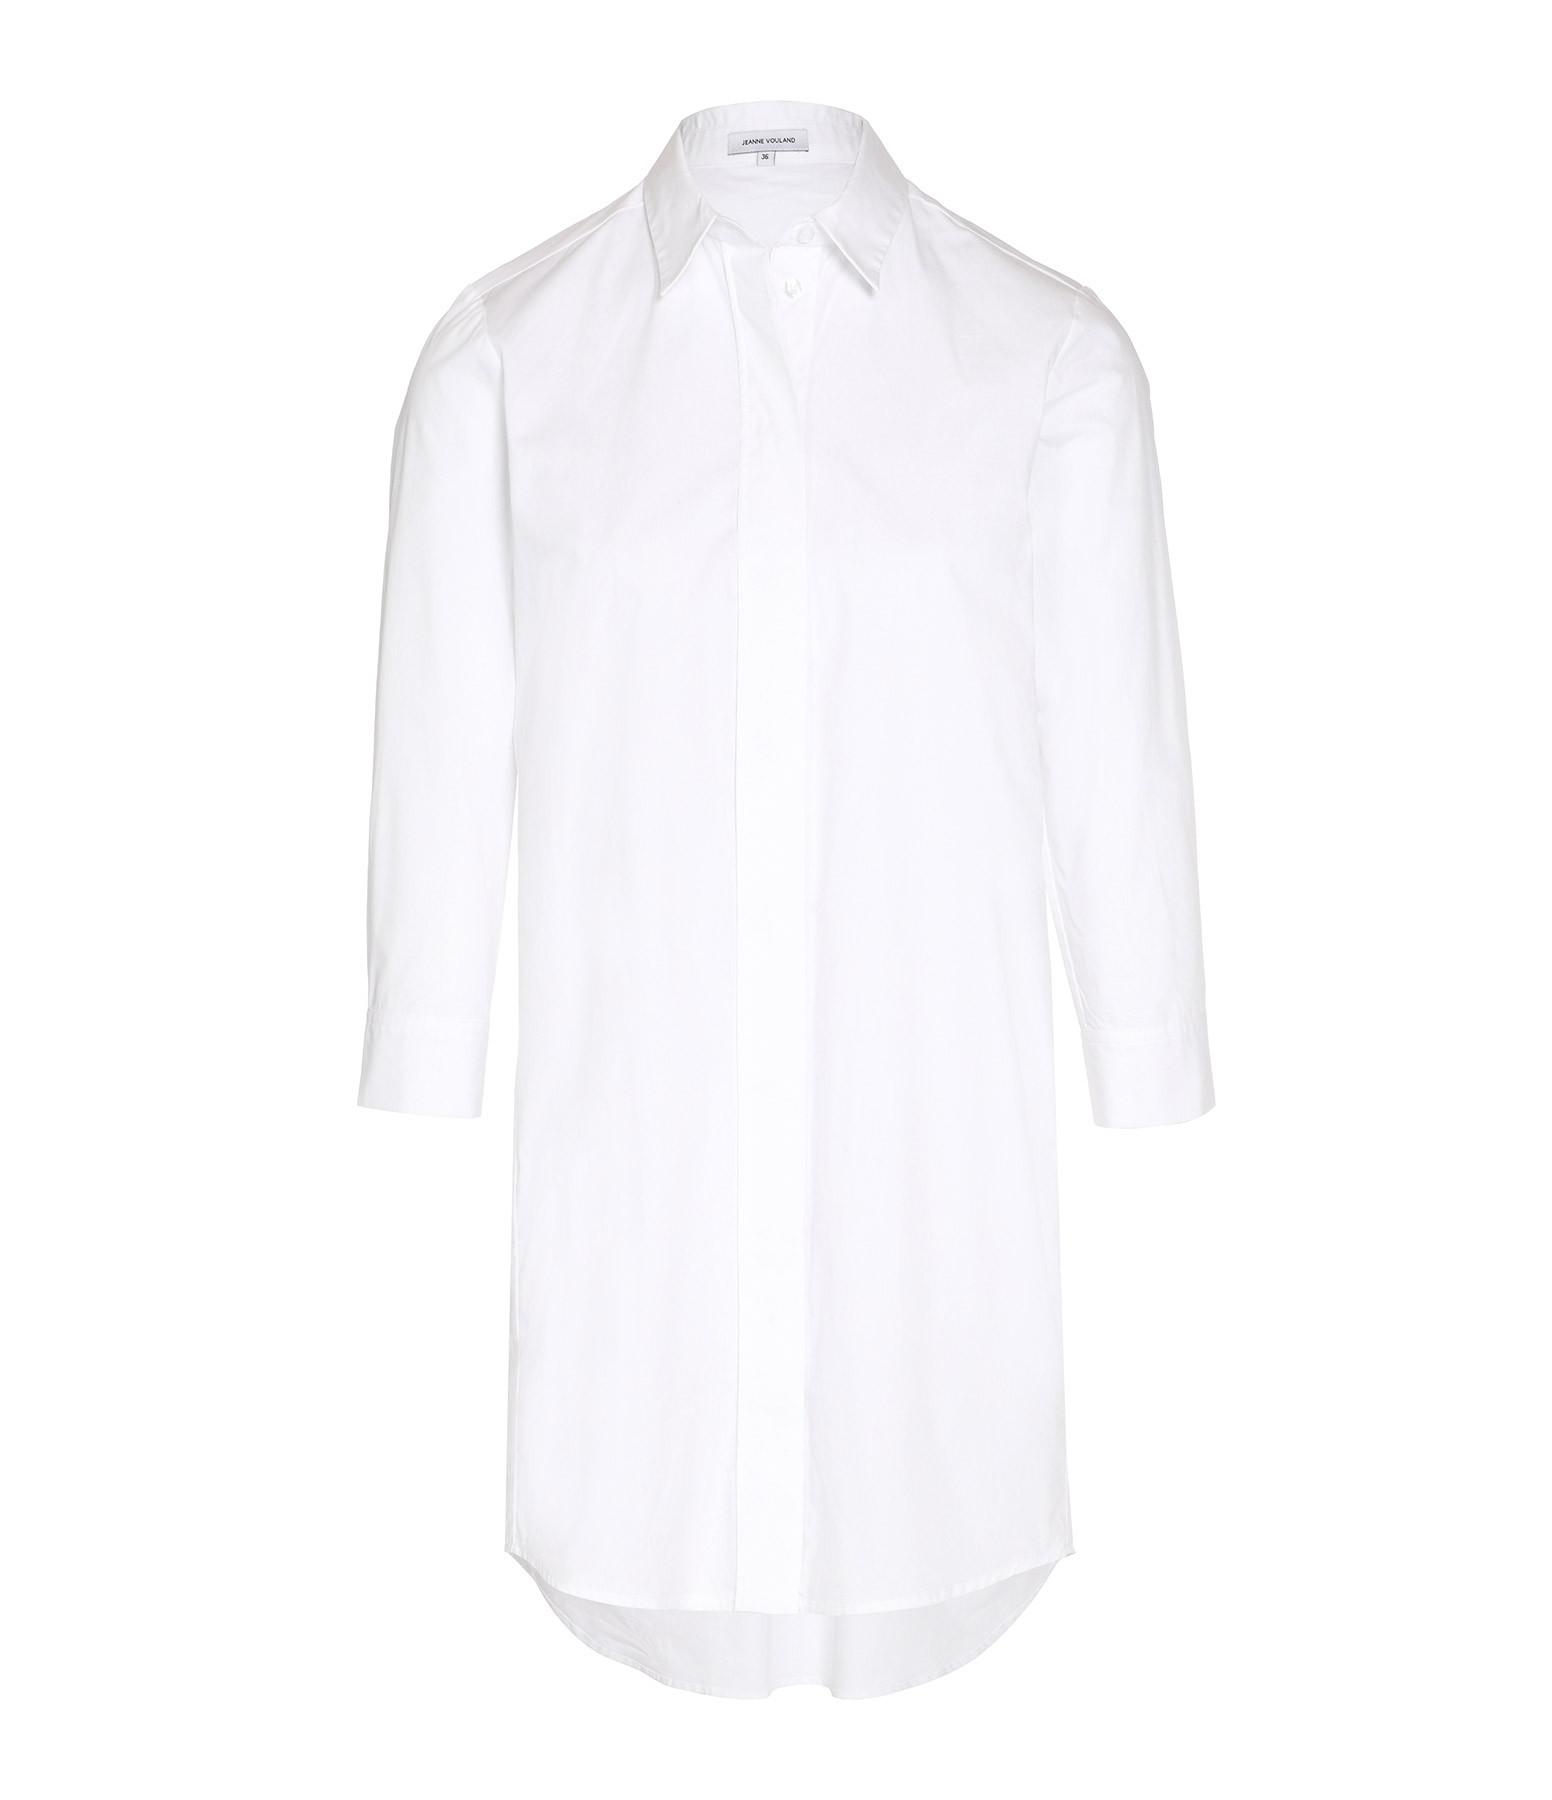 JEANNE VOULAND - Robe Chemise Baidy Brodé Coton Blanc